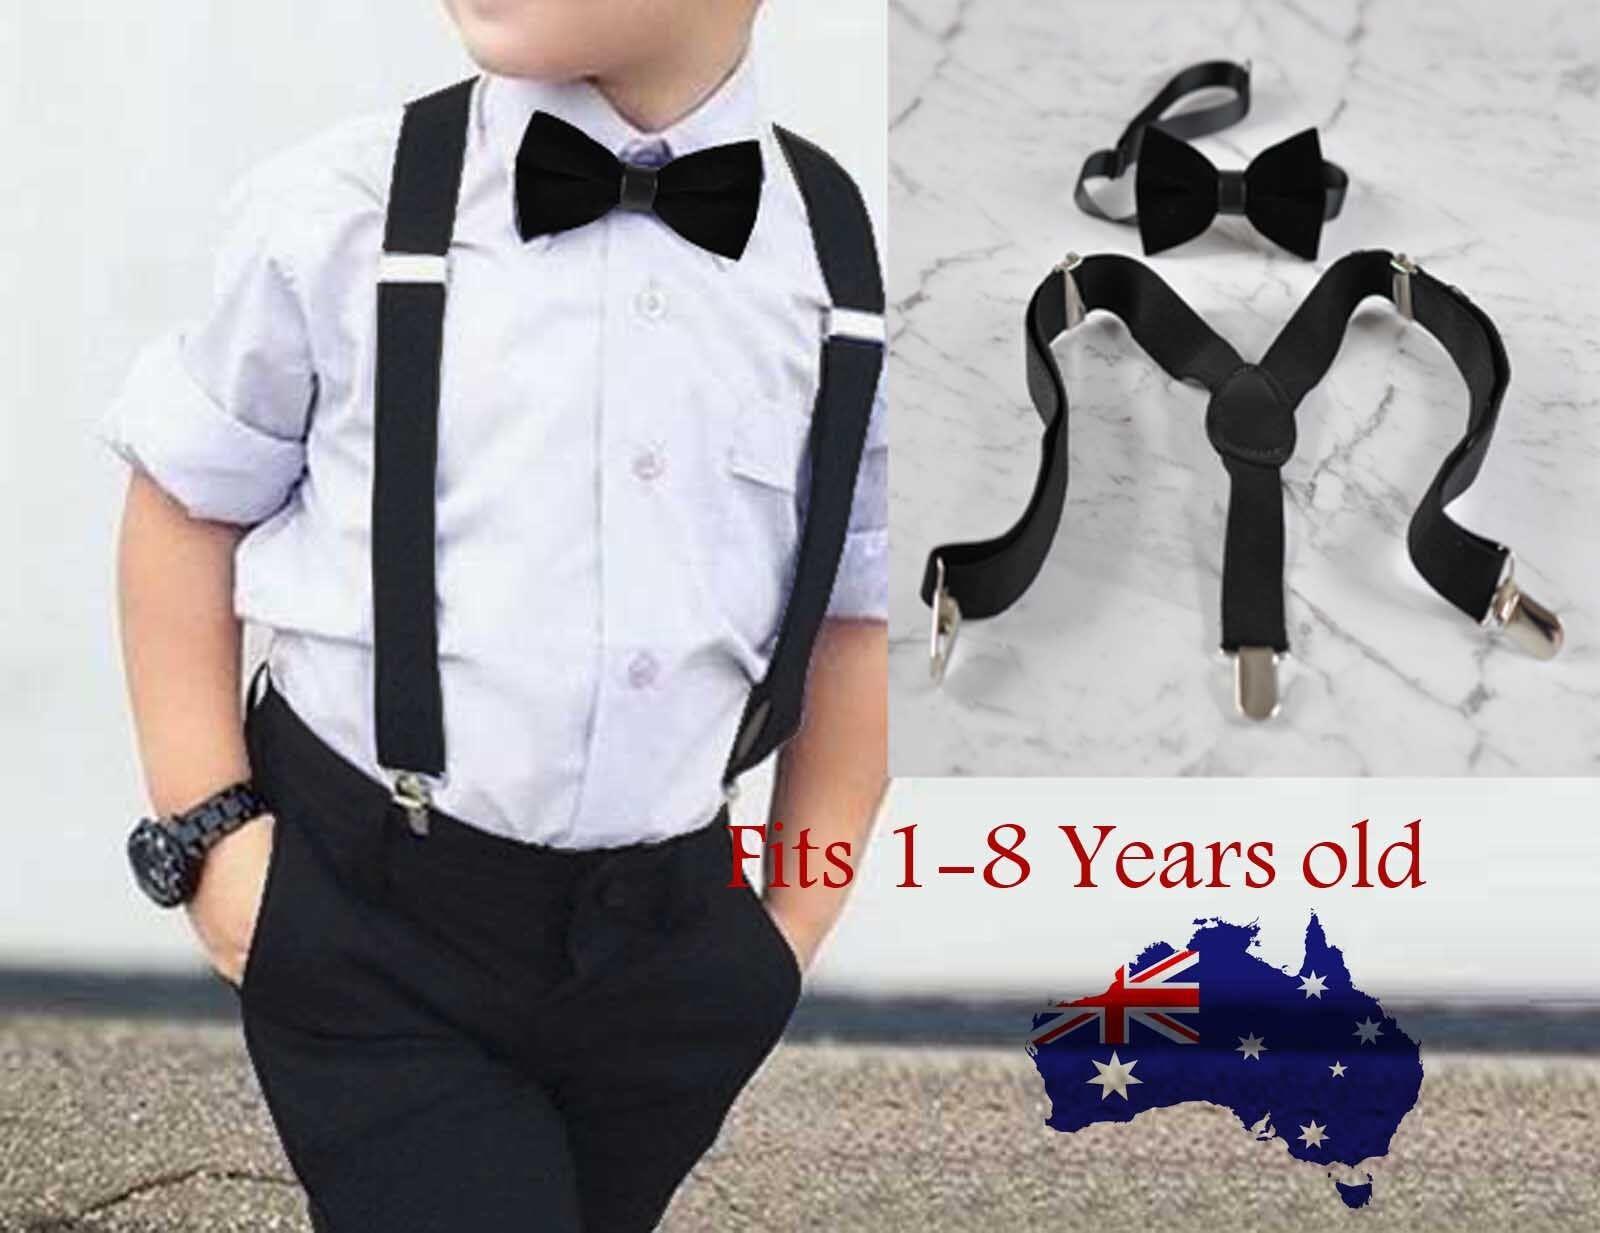 6e6a1aa0dd15b Details about Boy Baby Kids Black Velvet Bow Tie Bowtie Suspenders Braces  Sets 1-8 Years Old